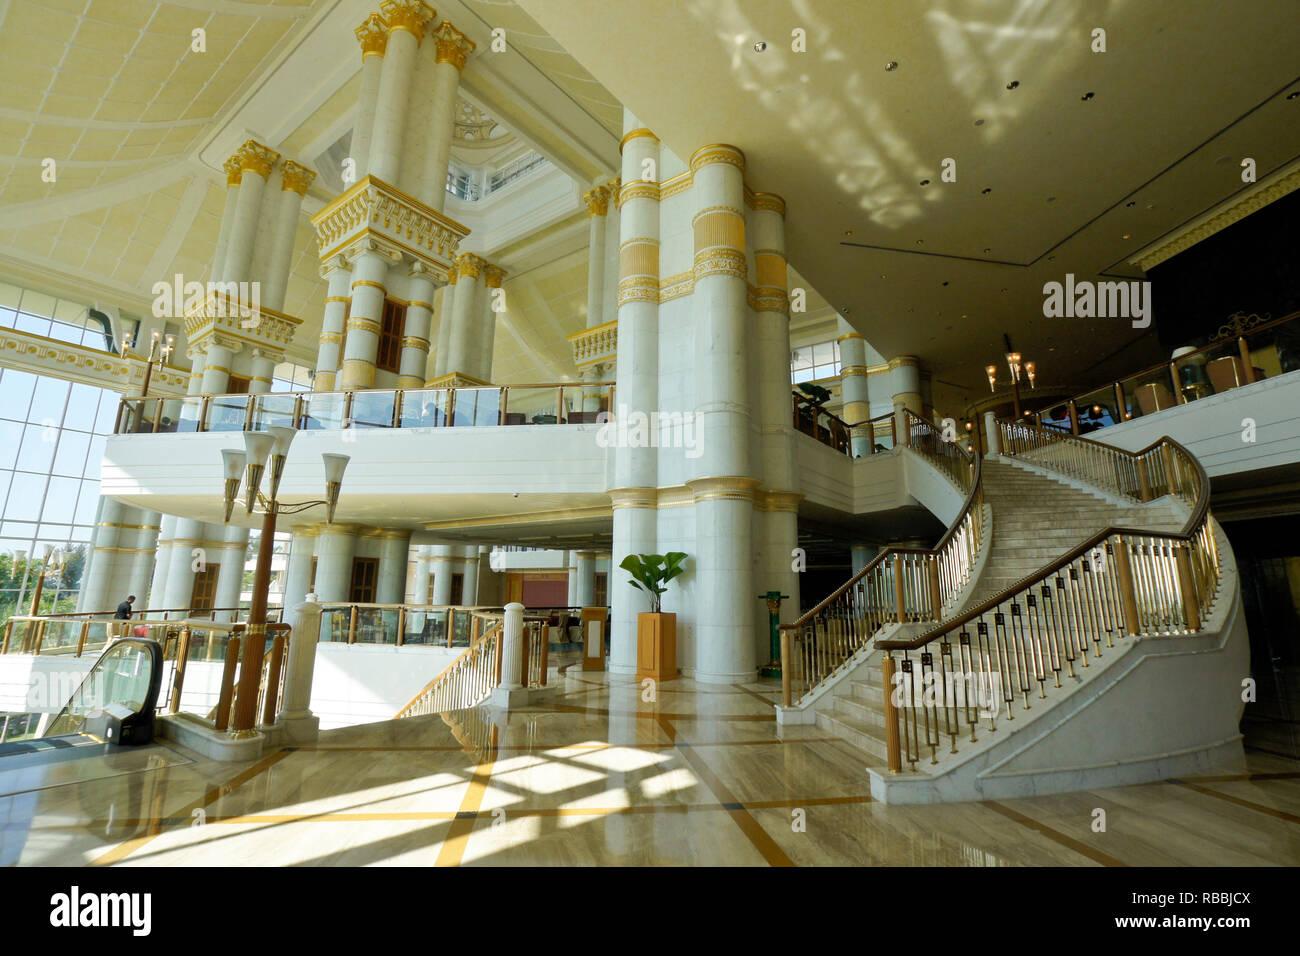 Empire Hotel and Country Club, Bandar Seri Begawan, Sultanate of Brunei - Stock Image